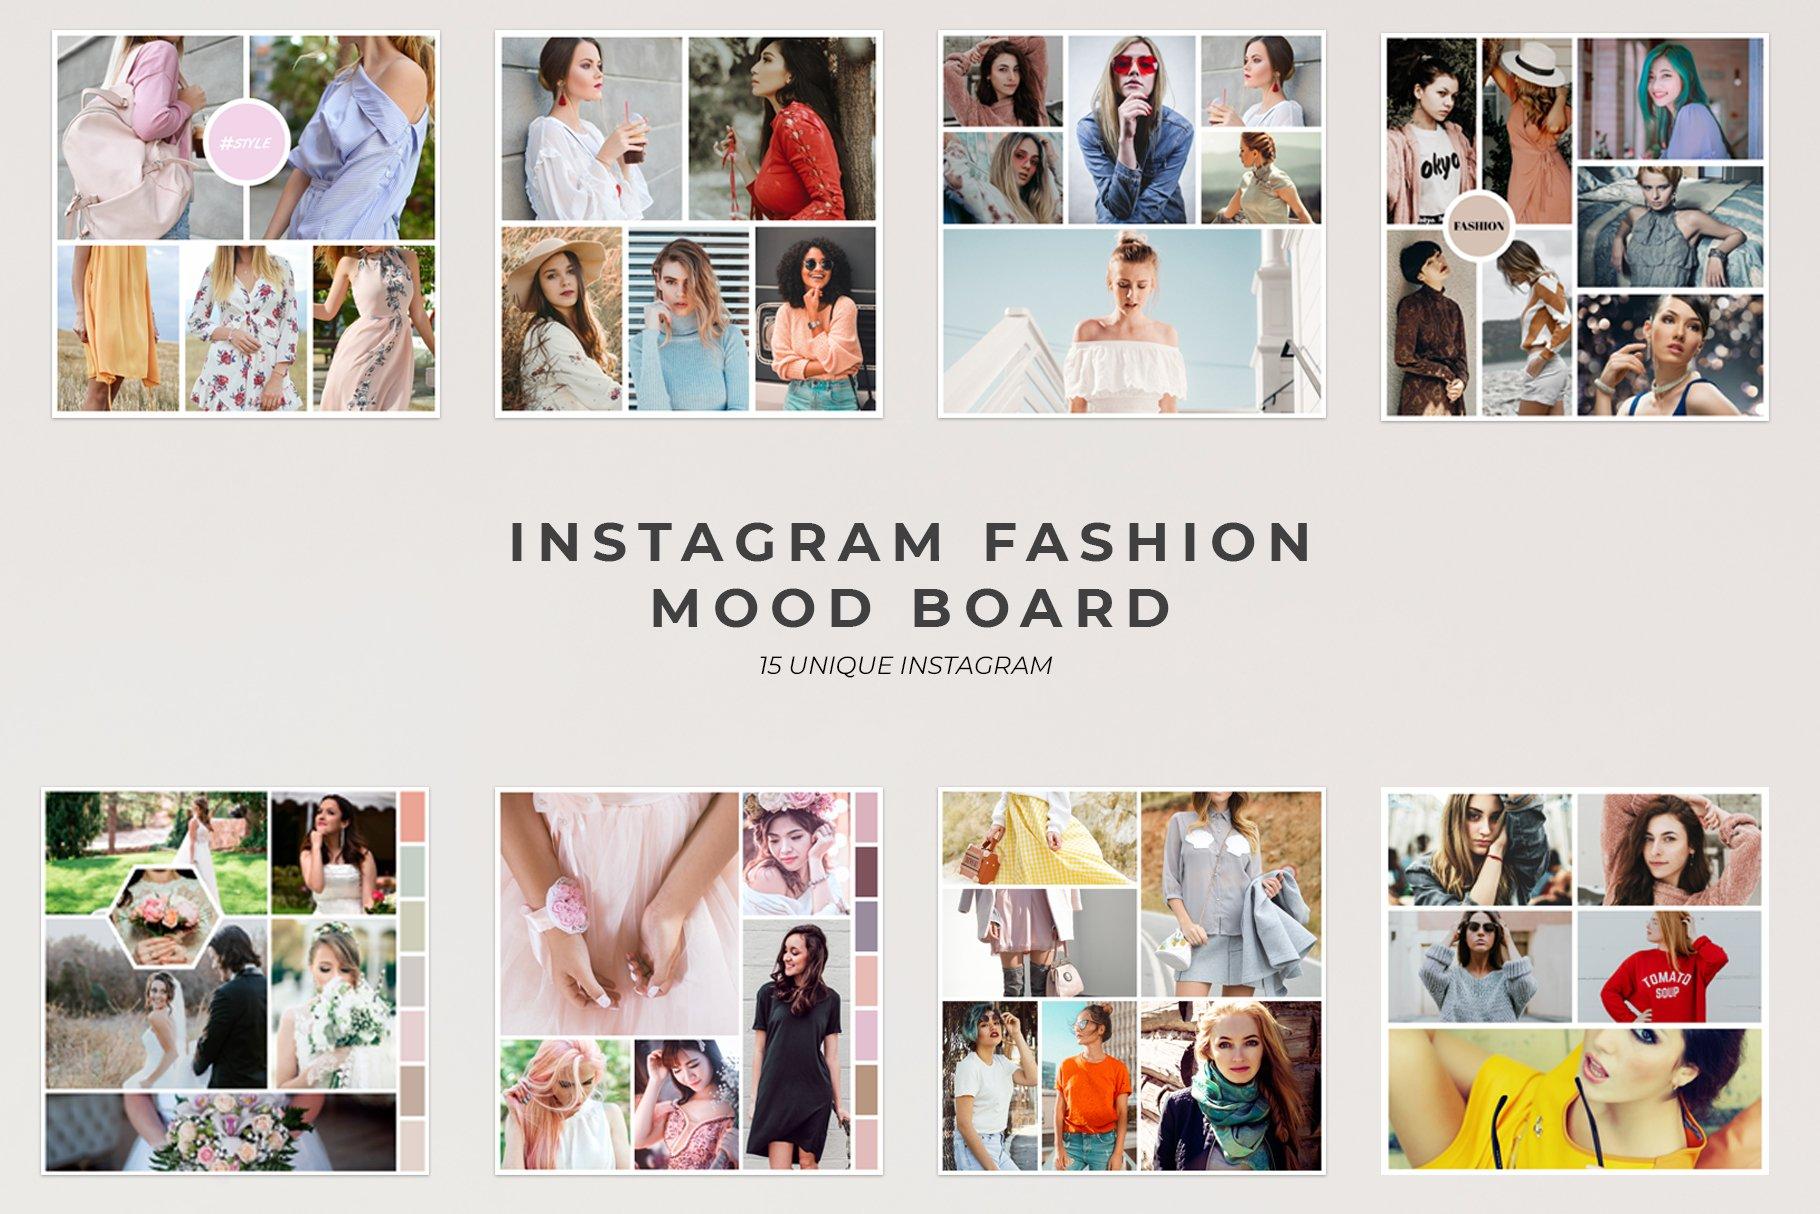 fashion mood board template - instagram fashion mood board social media templates